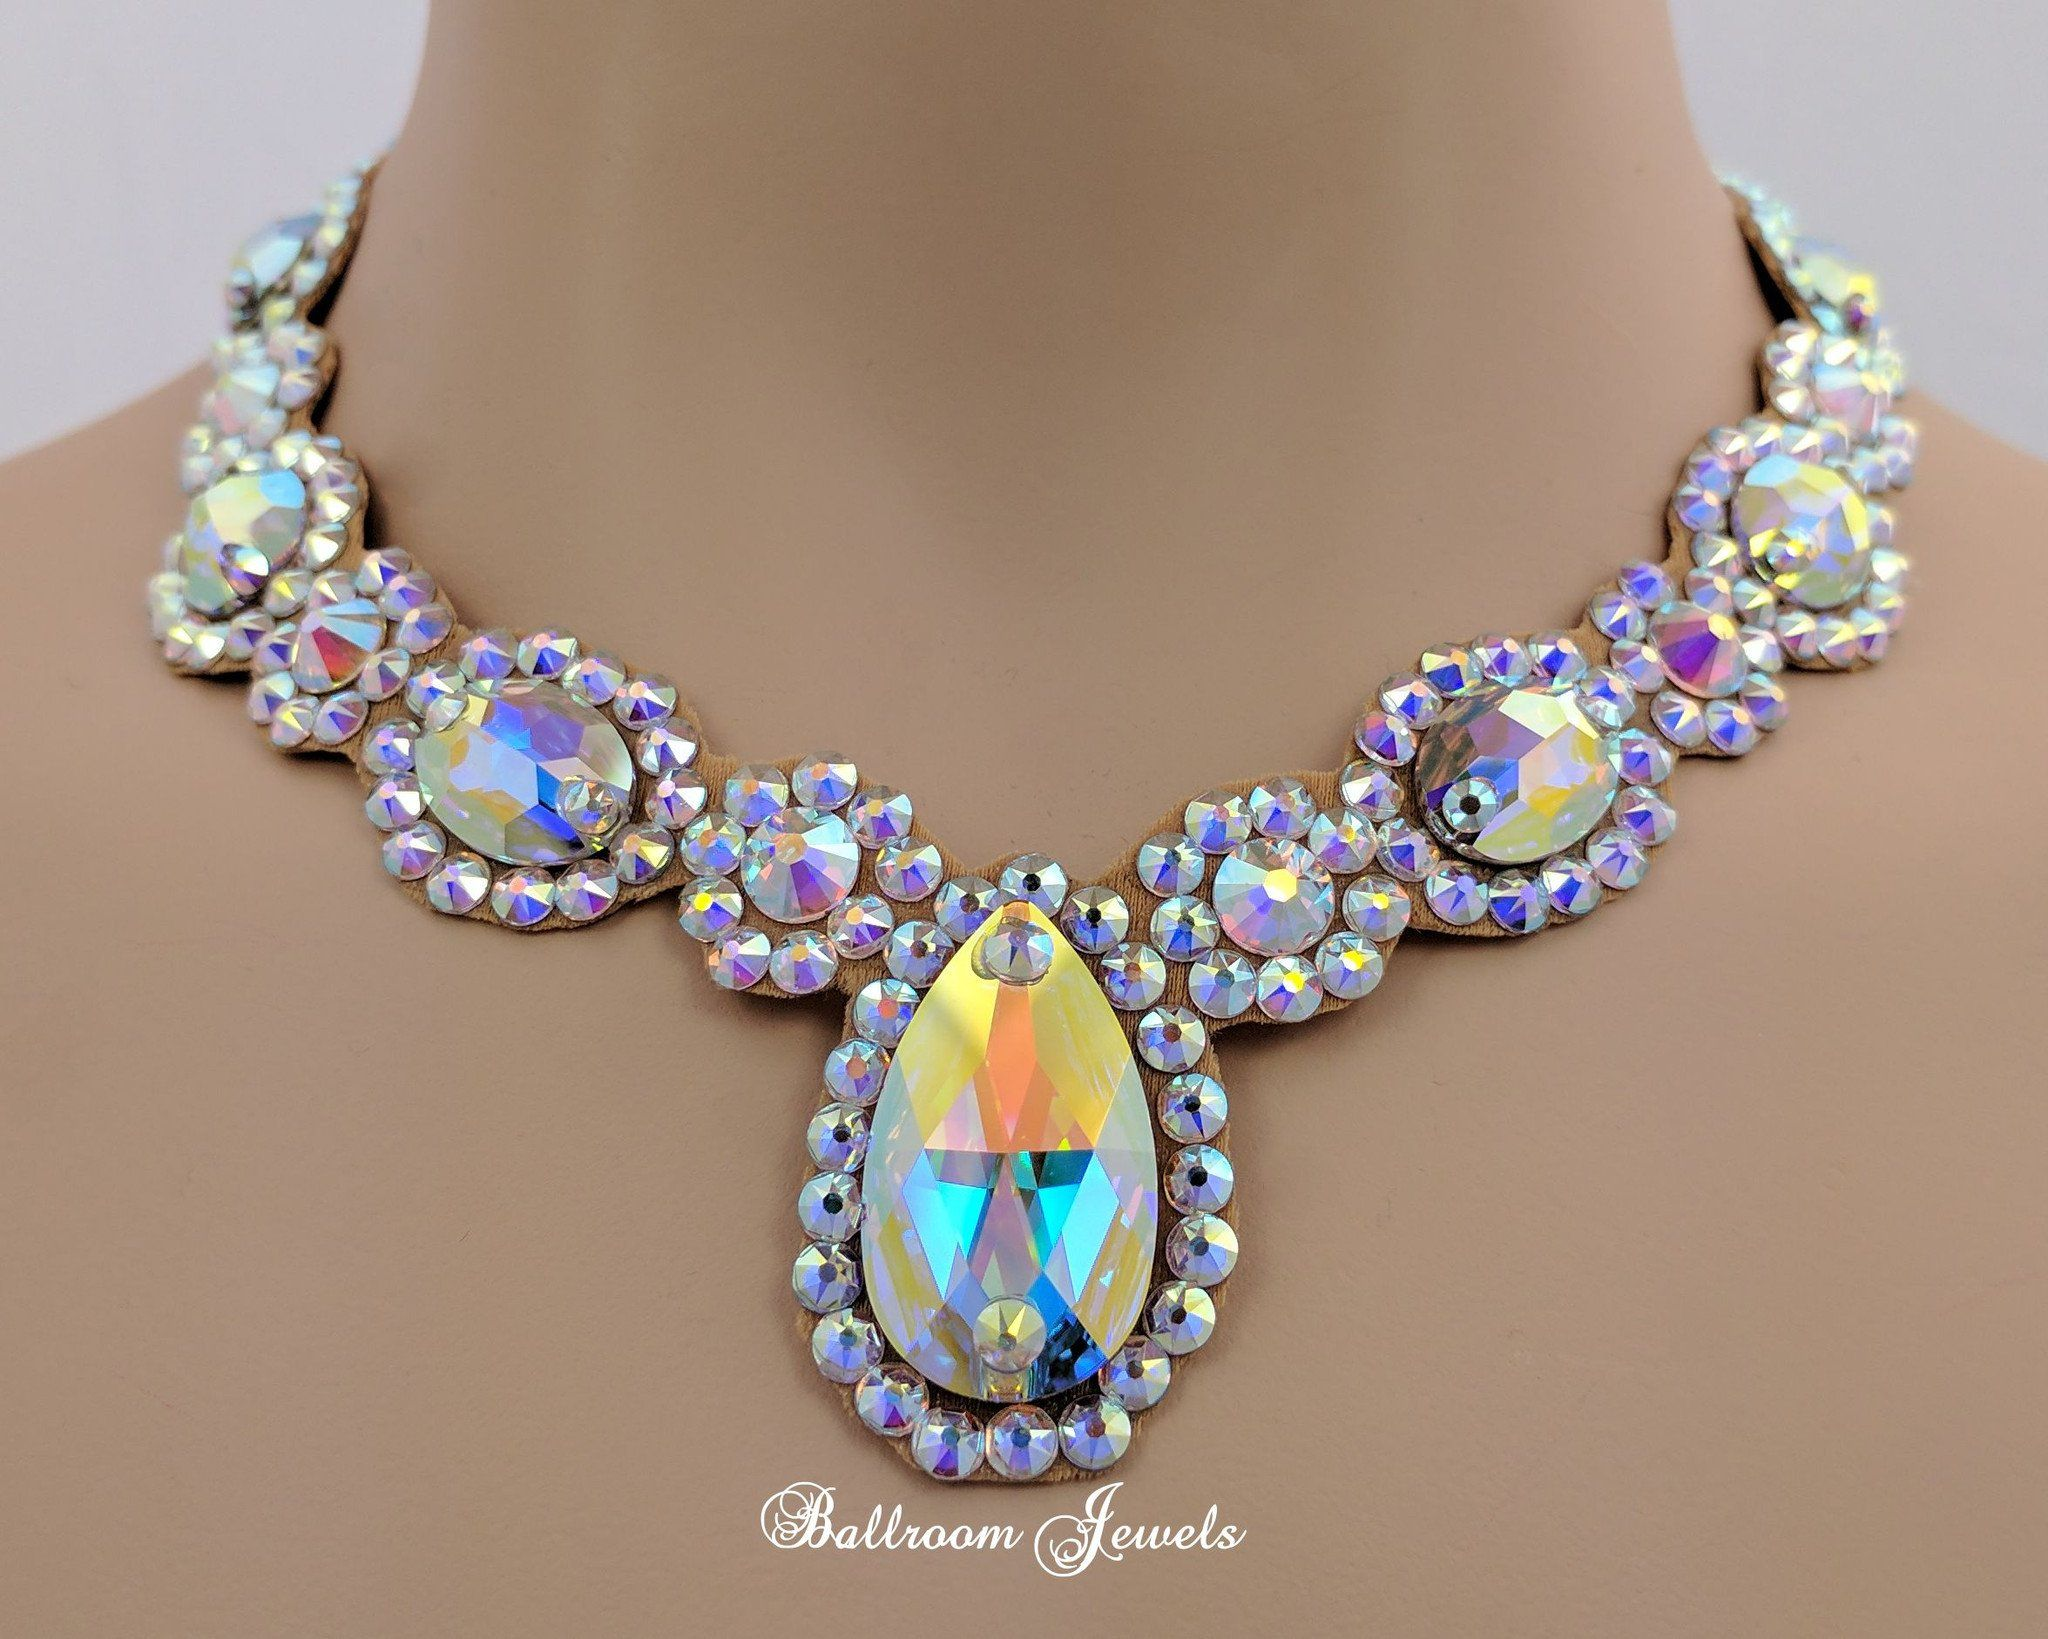 Ballroom Royal Design Crystal necklace Swarovski Crystals, Earrings,  Bracelets, Royal Design, Crystal